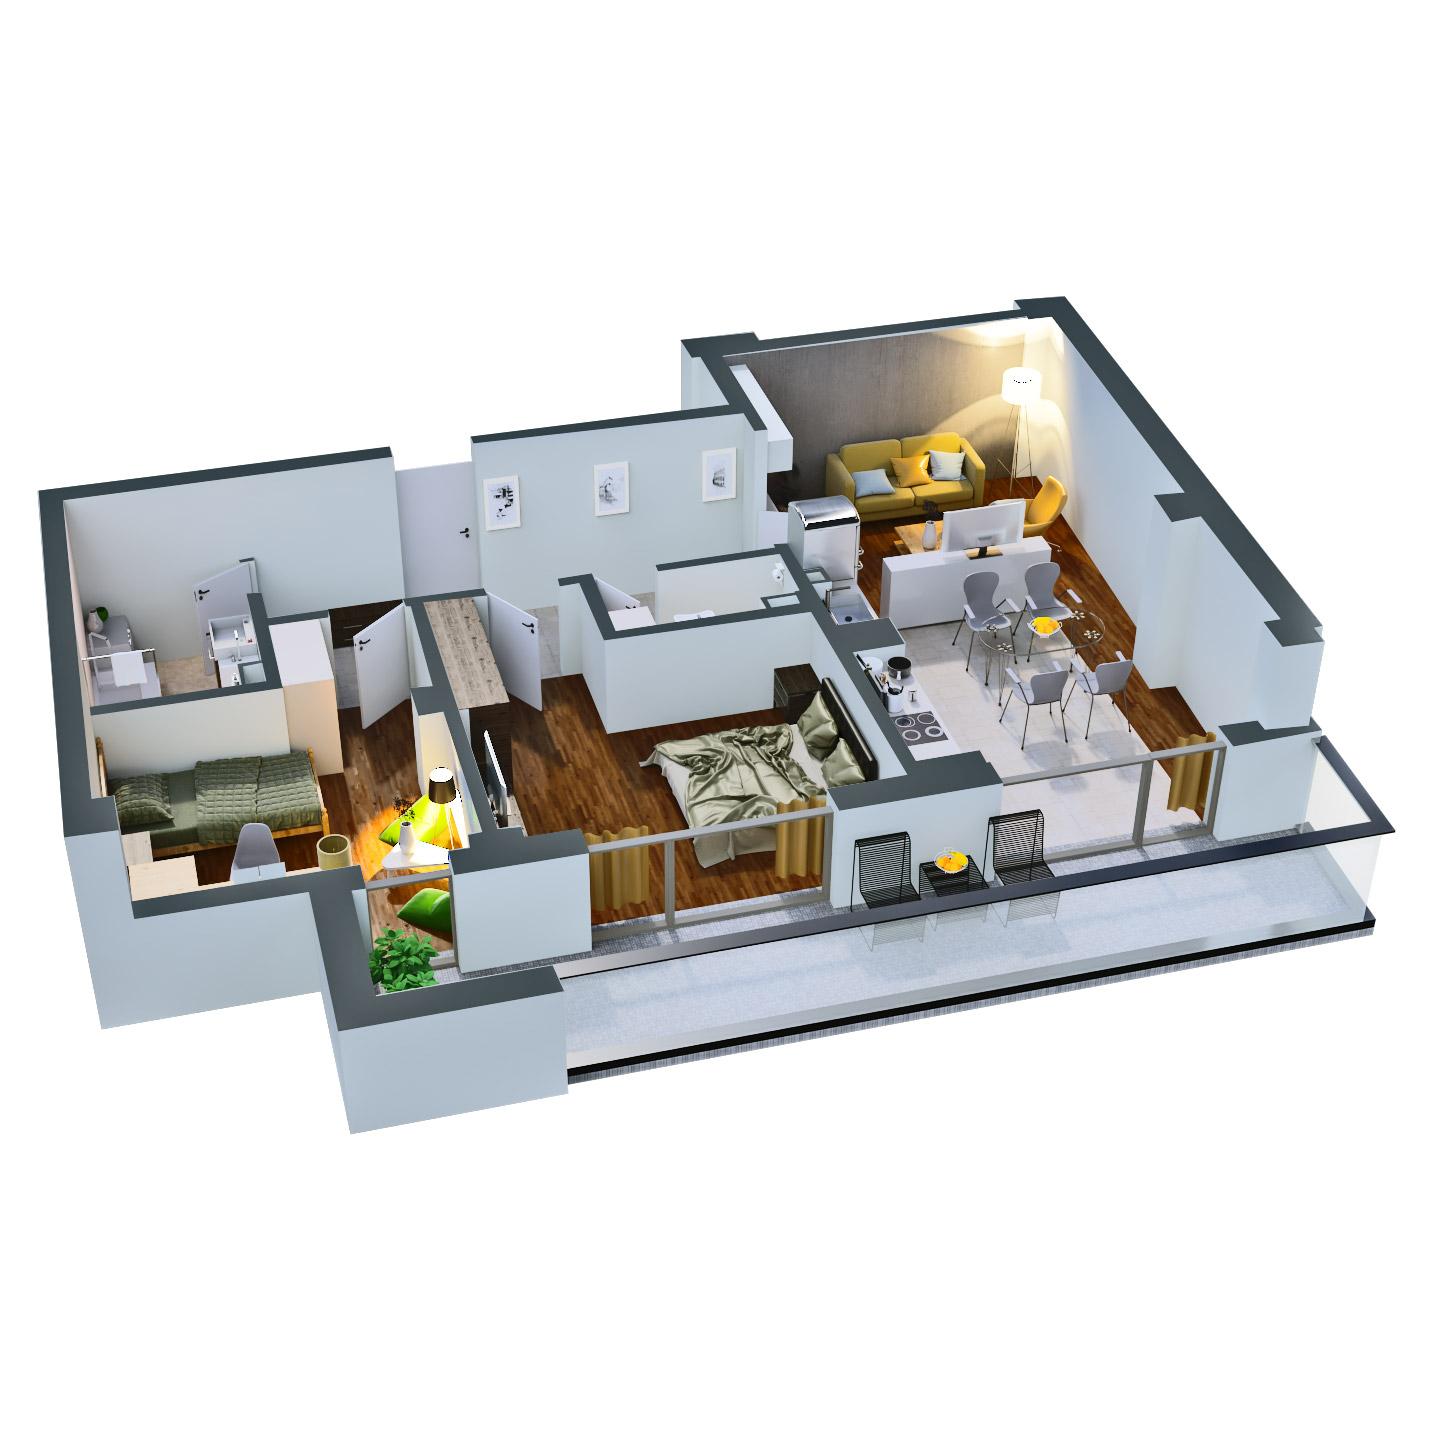 Apartament 3 camere de vanzare Bucuresti - Catedral Residence - Marriott, Piata Unirii, 13 Septembrie, Izvor - Tip 4 - T2 - D